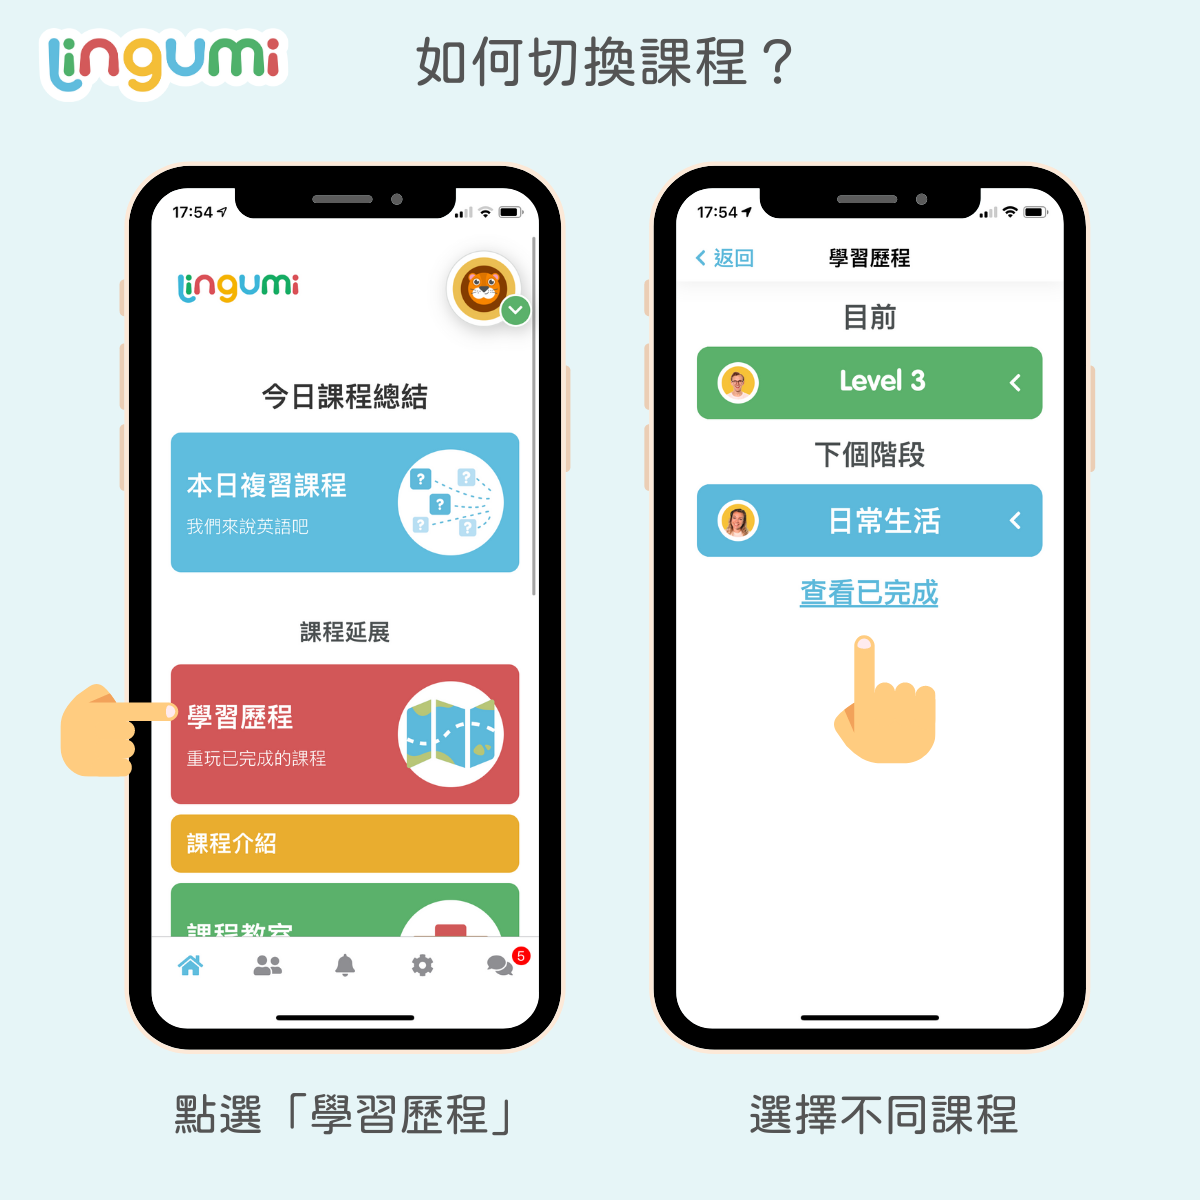 Lingumi 課程切換